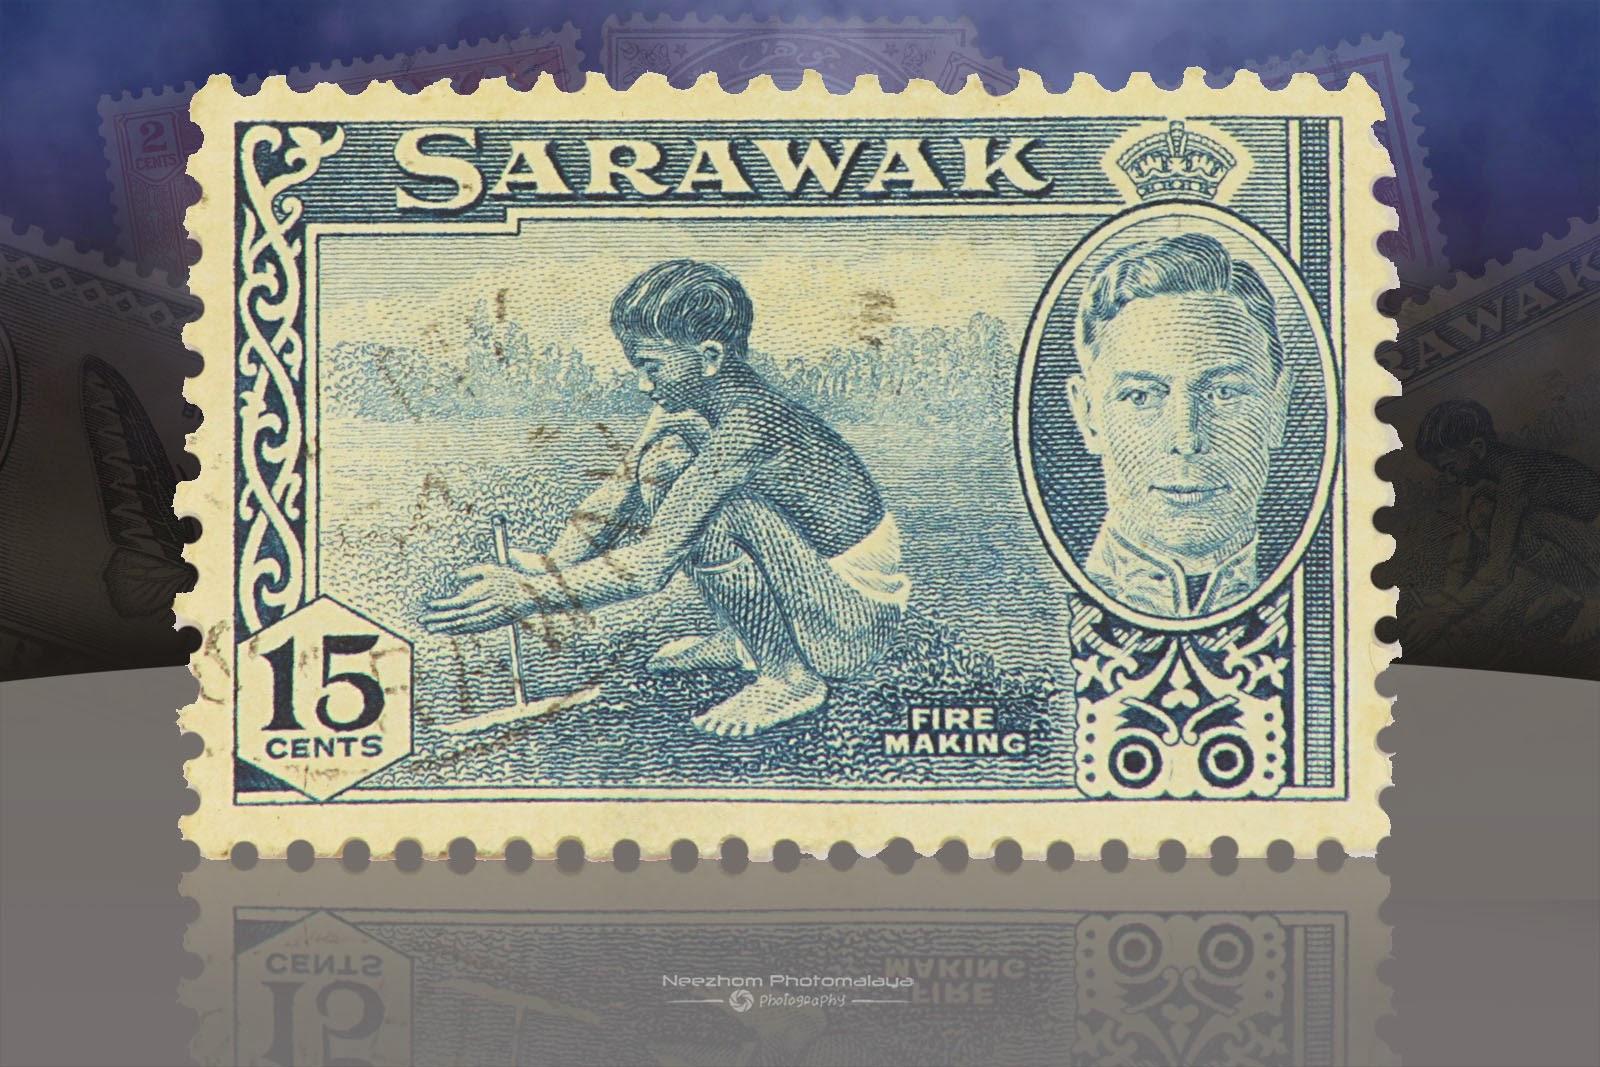 Setem Sarawak 15 Cents Fire making 1950